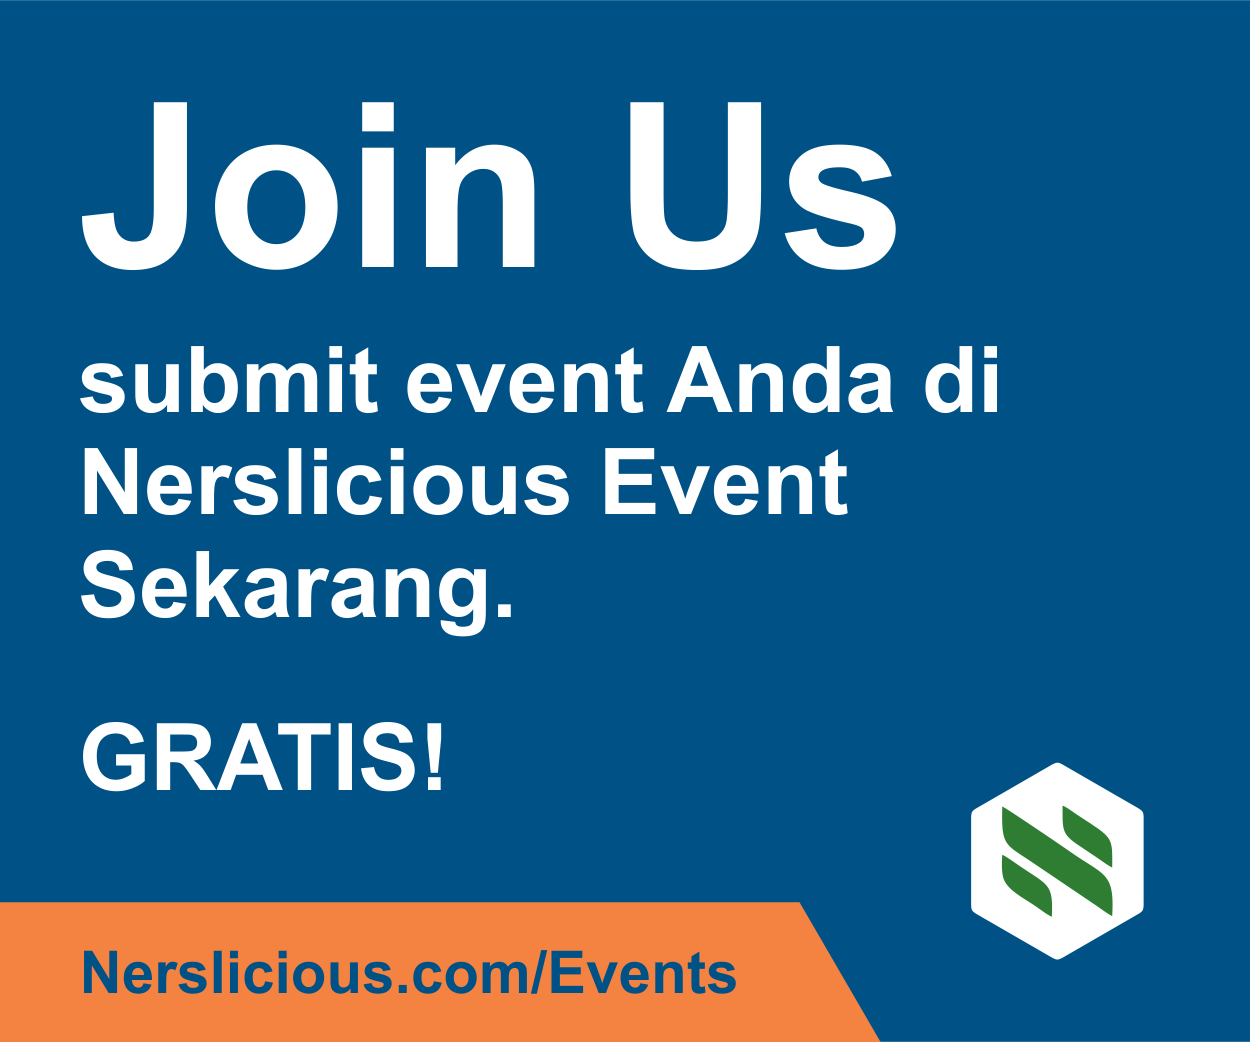 Nerslicious Event